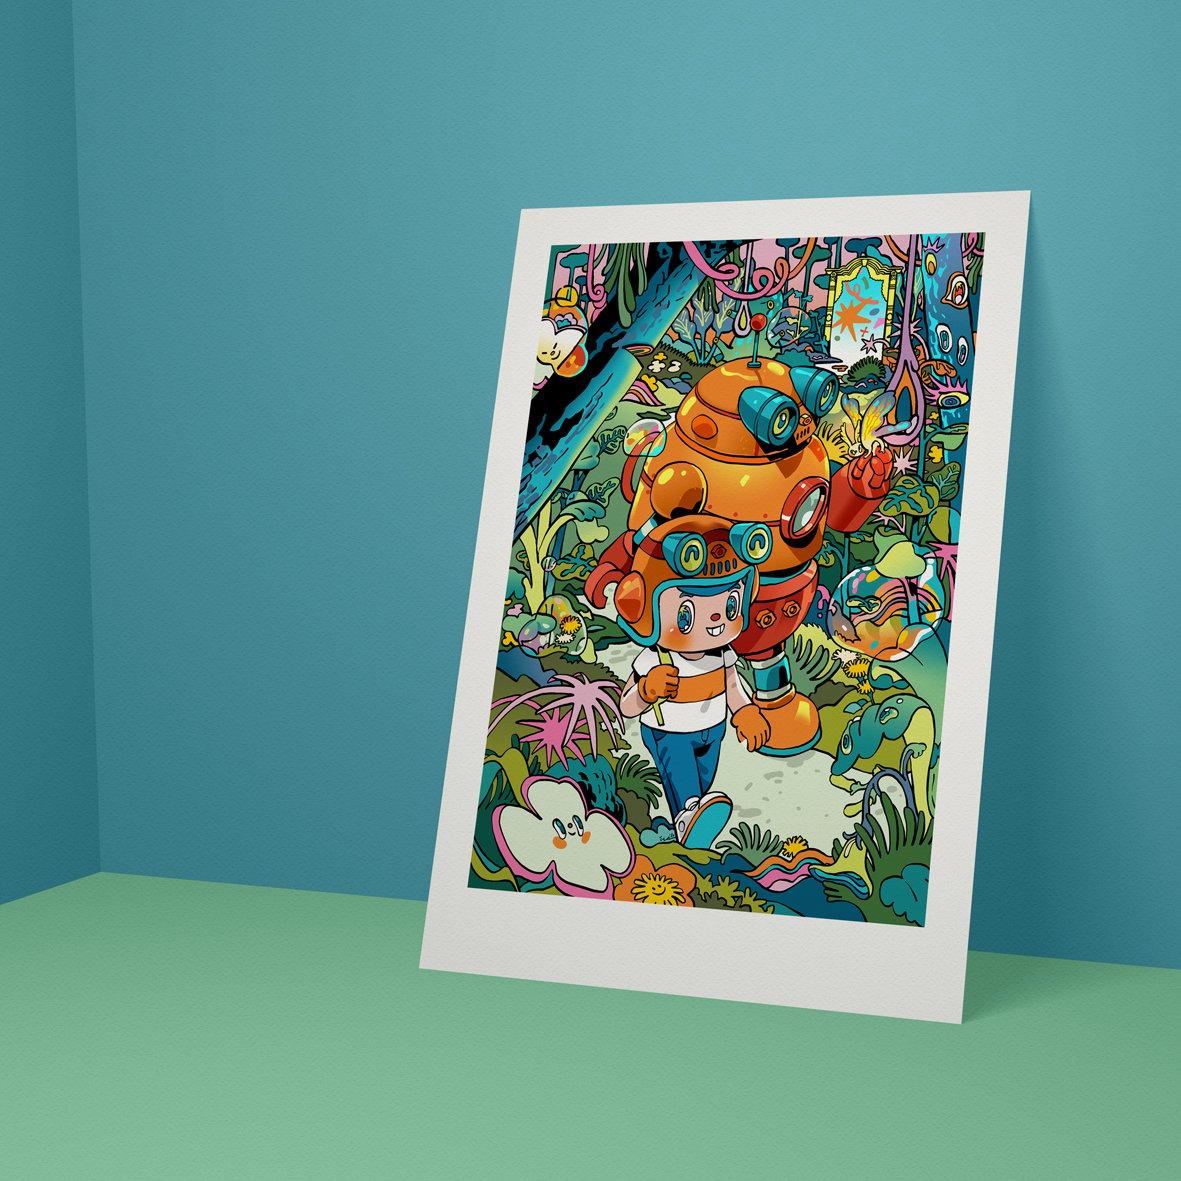 Image of Owange team art print collaboration with Isa indra permana